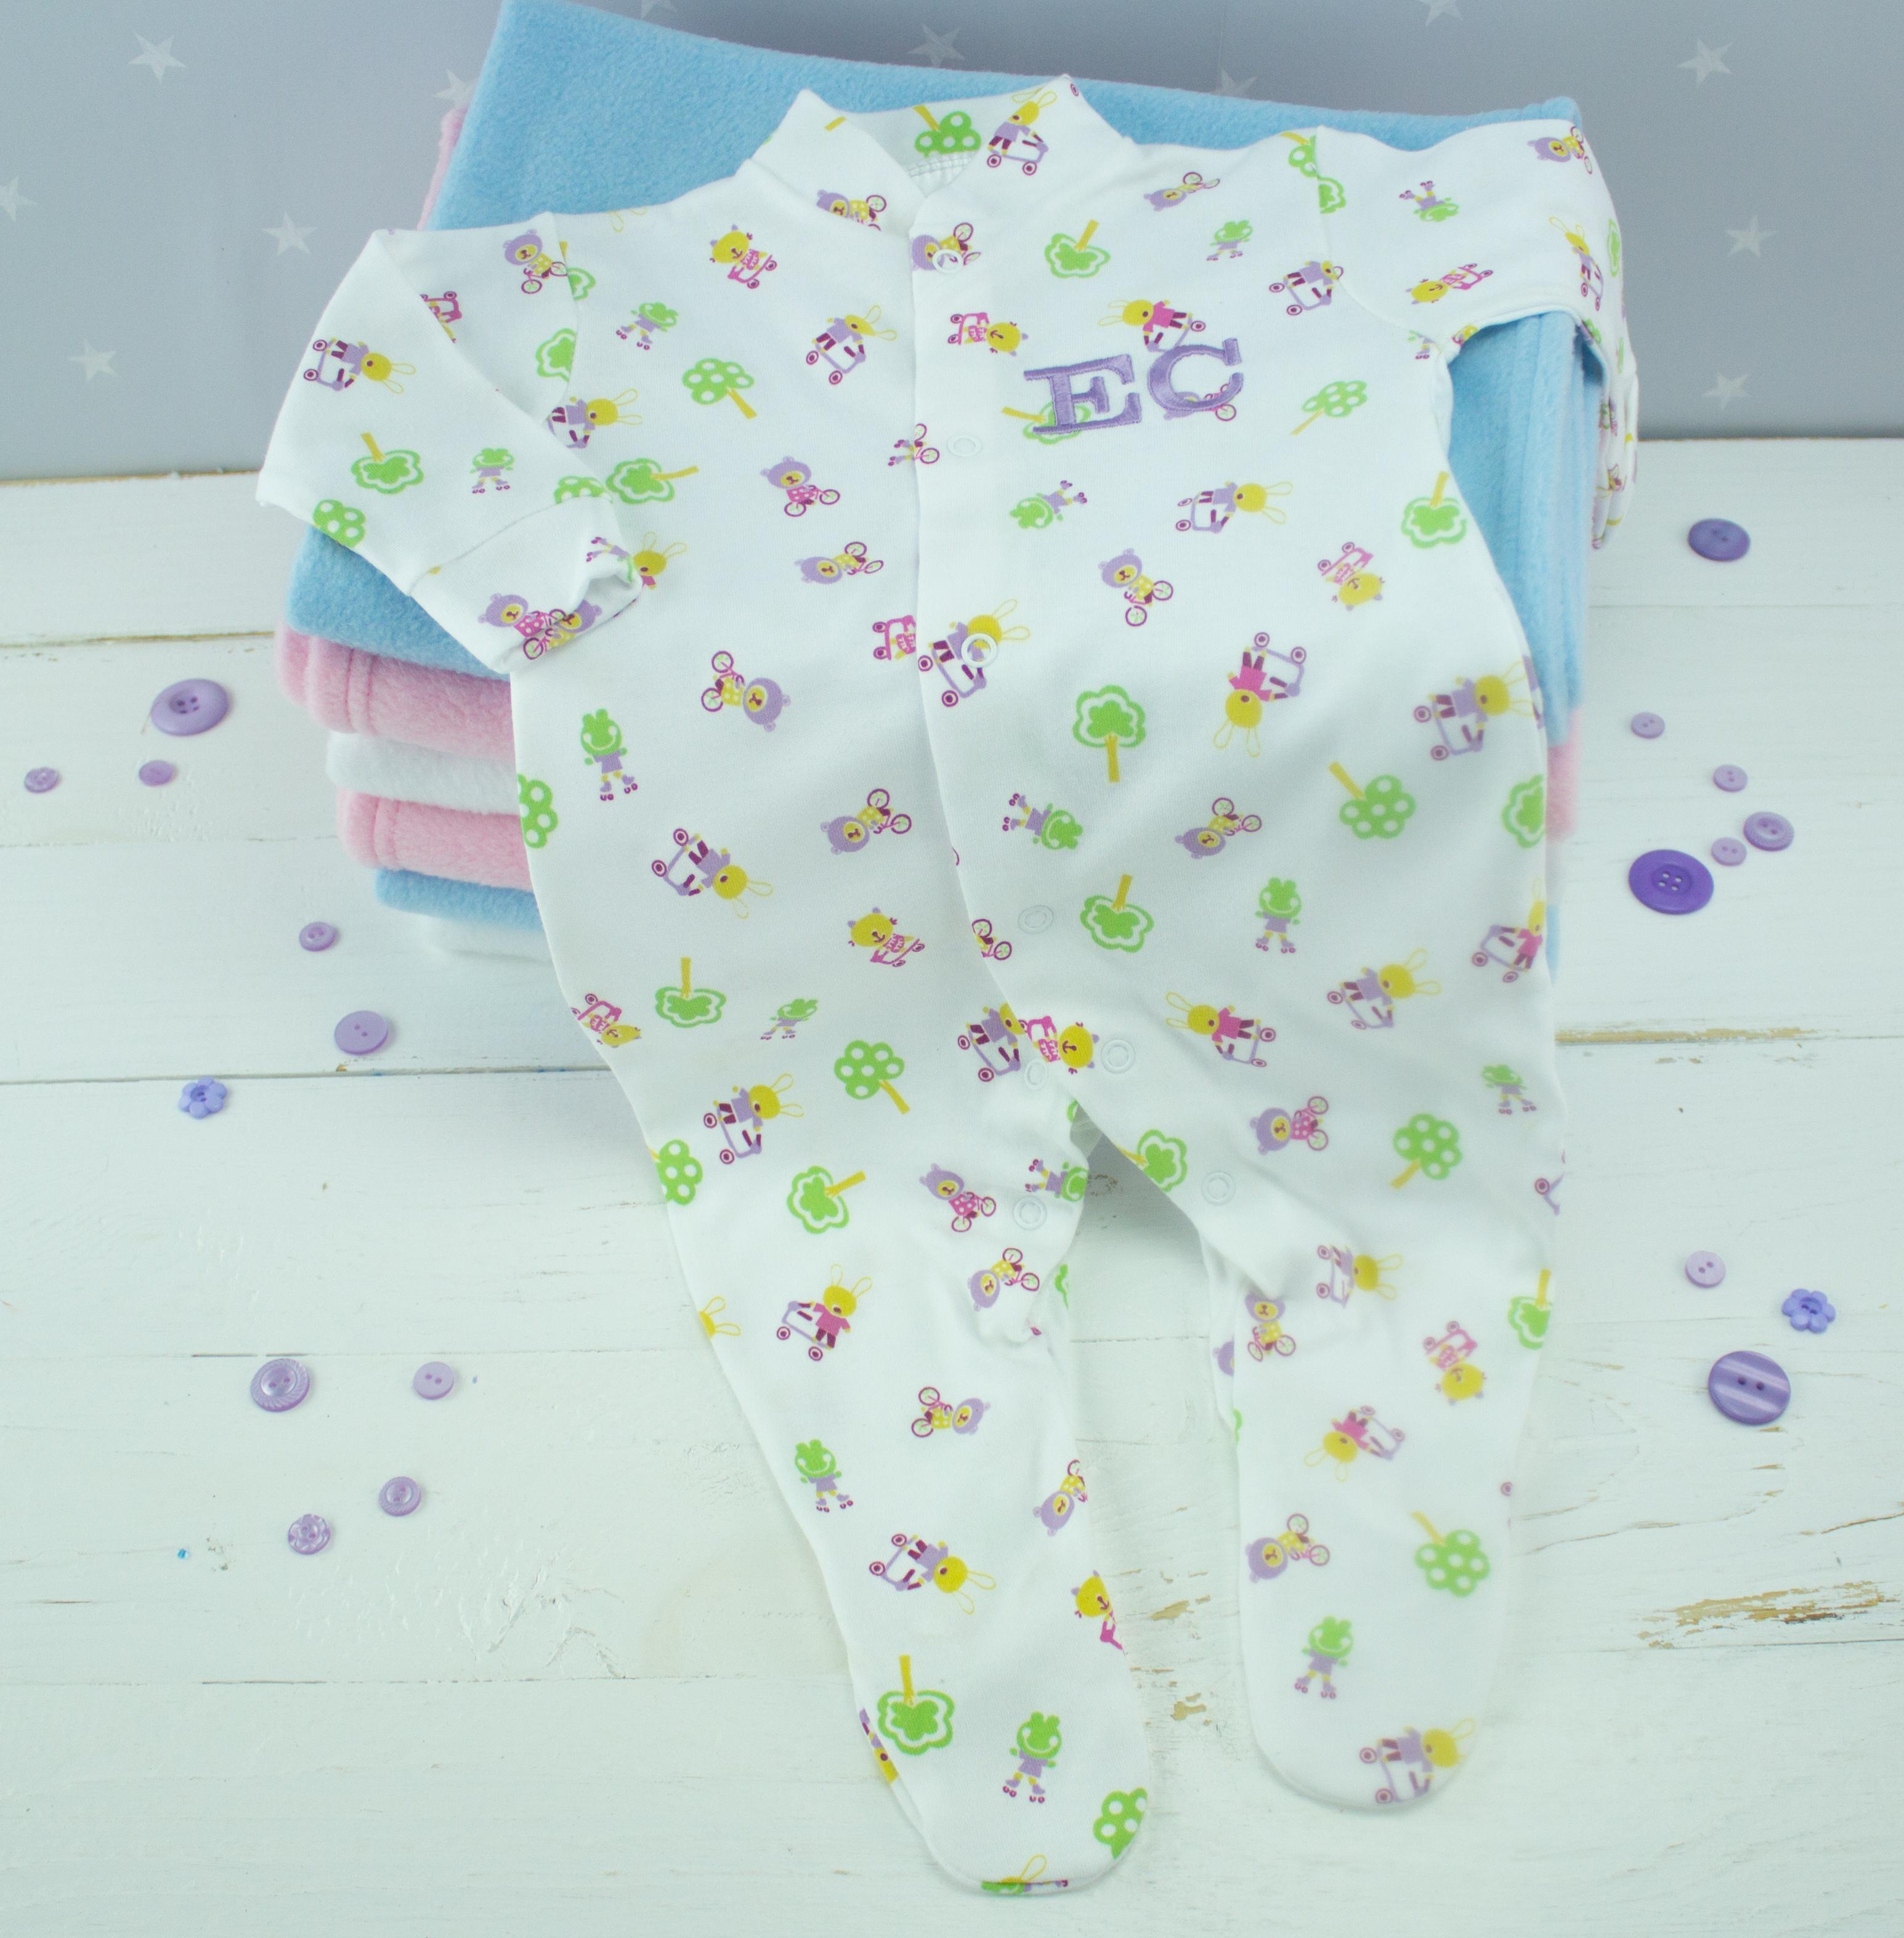 096839f68 Personalised White Baby Girl Sleepsuit - Nature Print   Heavensent ...